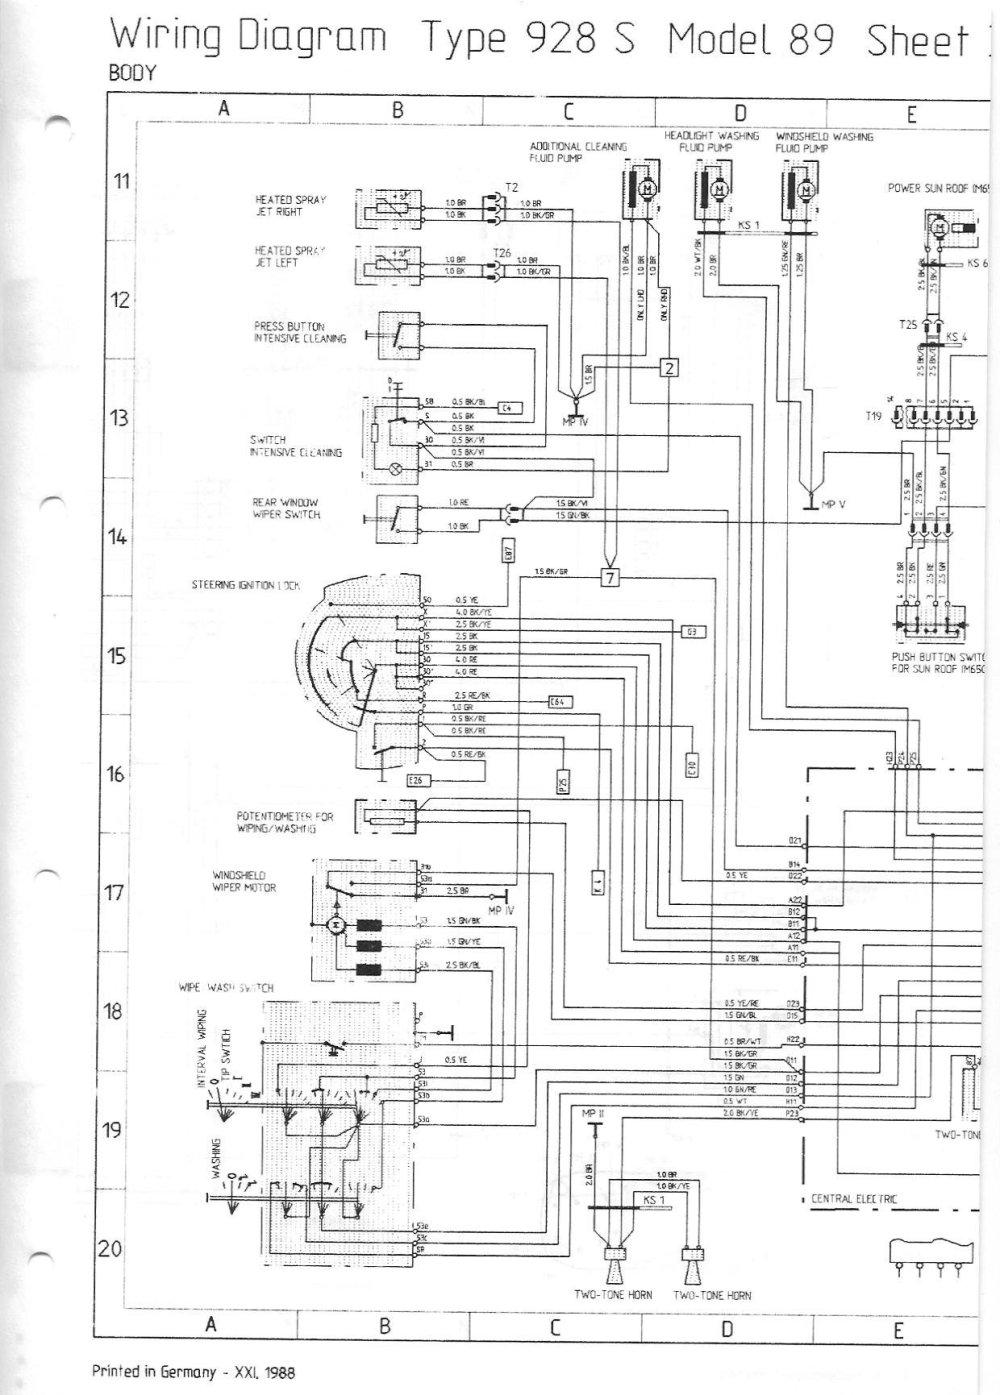 medium resolution of 1984 porsche 944 sunroof wiring diagram wiring diagram update 1984 porsche 944 fuse diagram 1984 porsche 944 sunroof wiring diagram